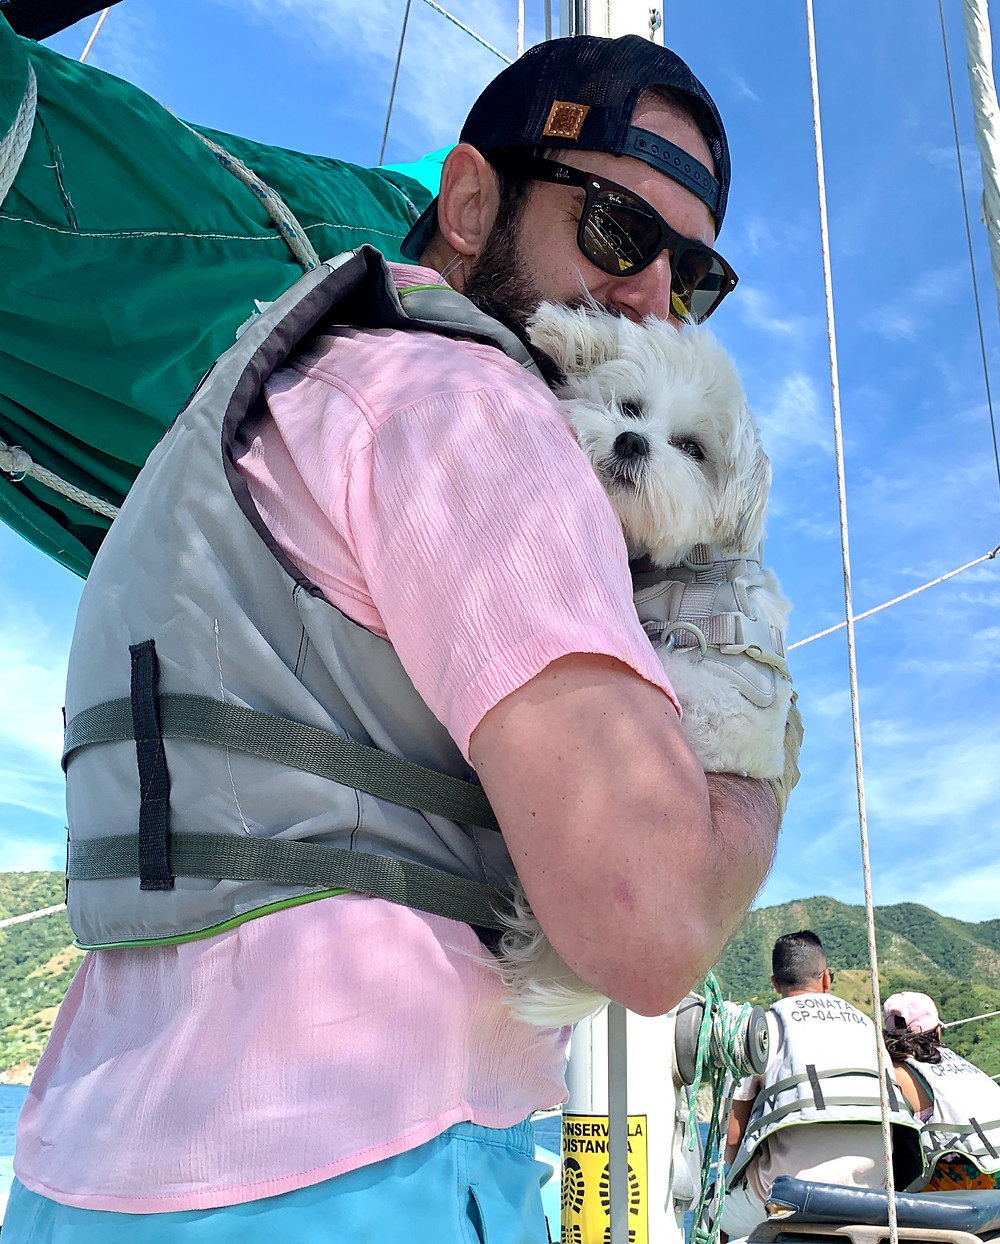 dog work life balance interoperate